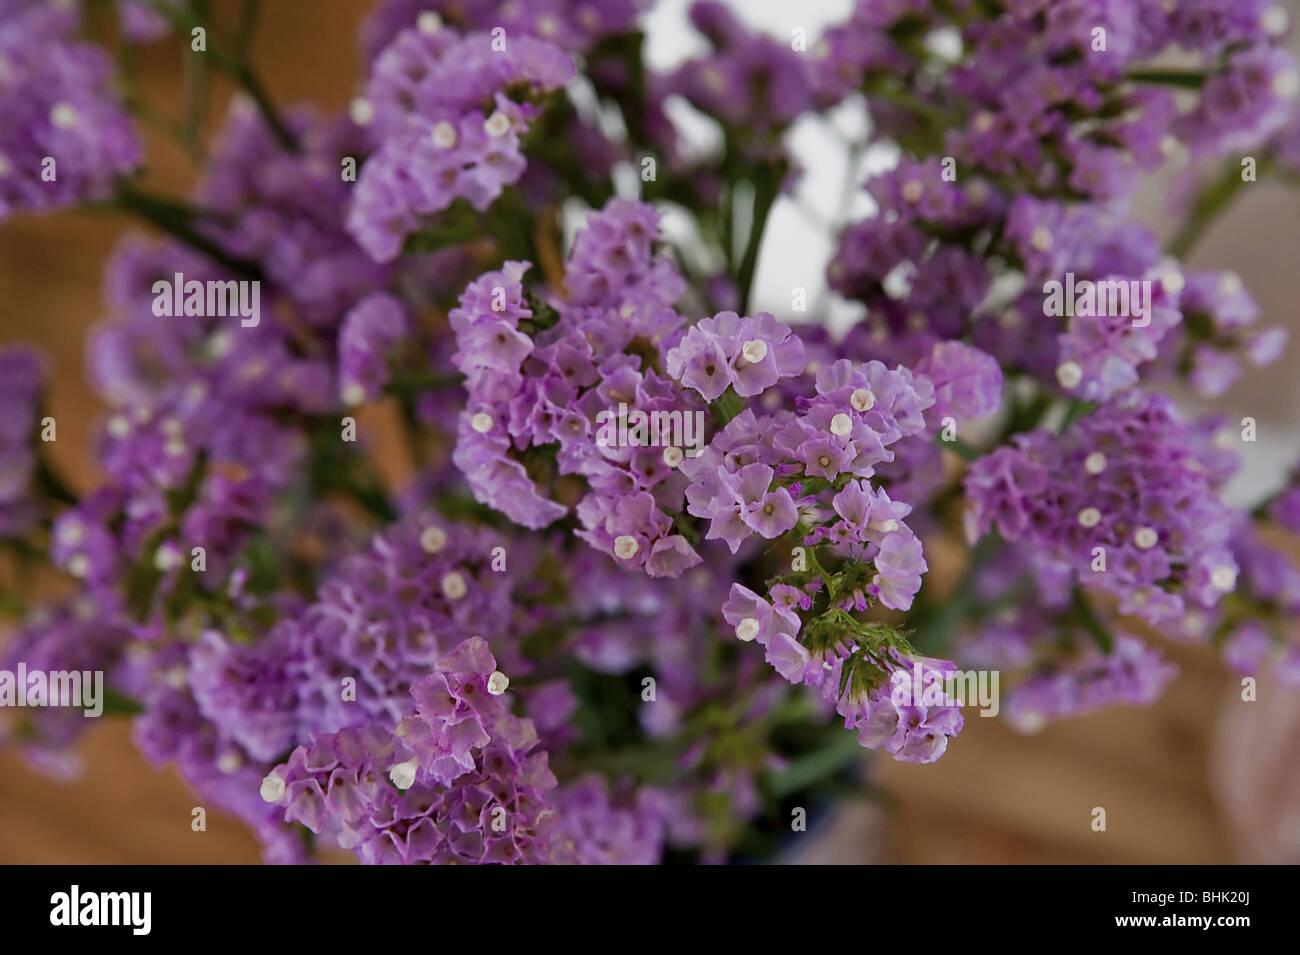 Fiori viola close up Immagini Stock